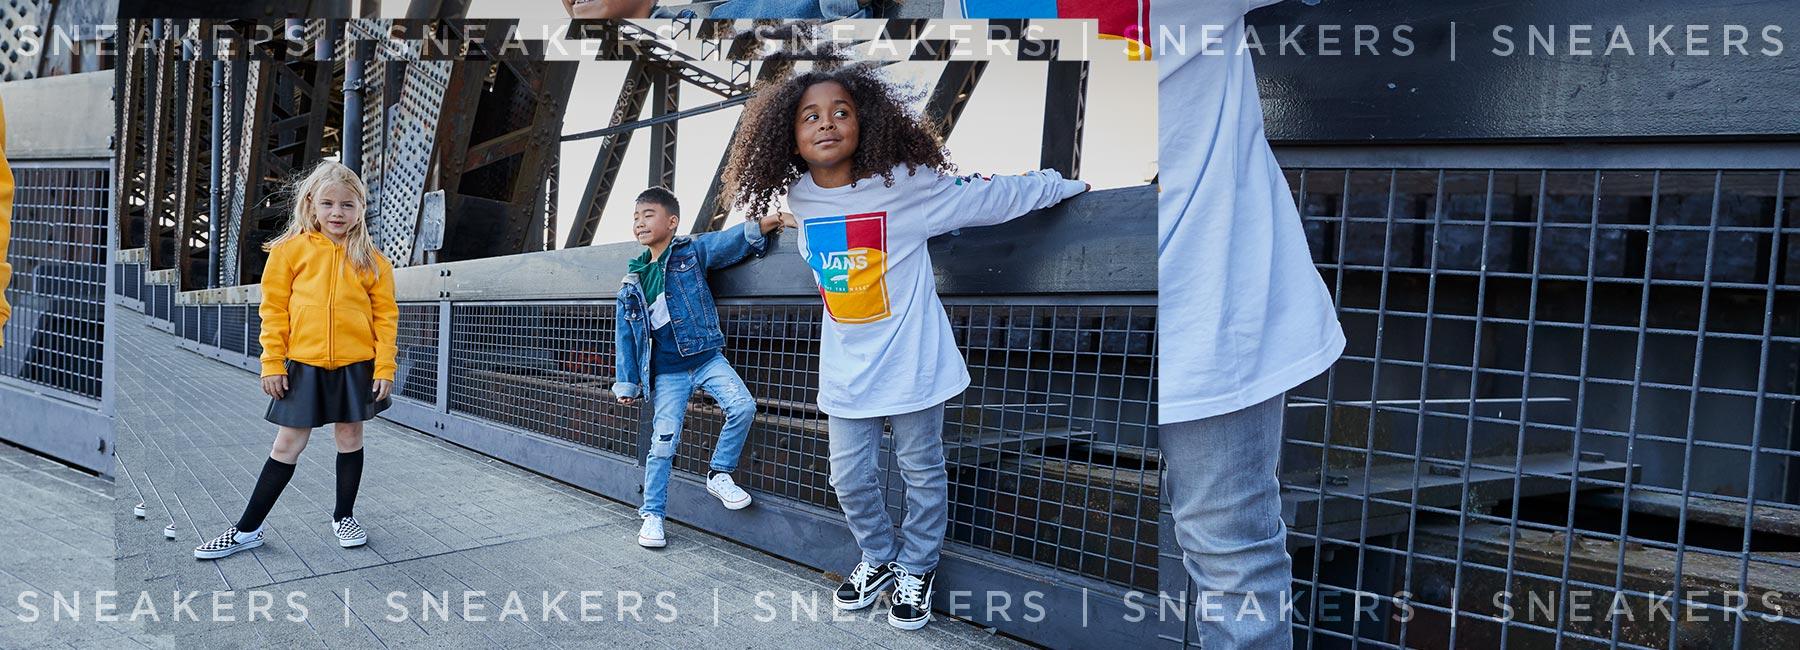 Shop sneakers from your favorite brands at Journeys Kidz